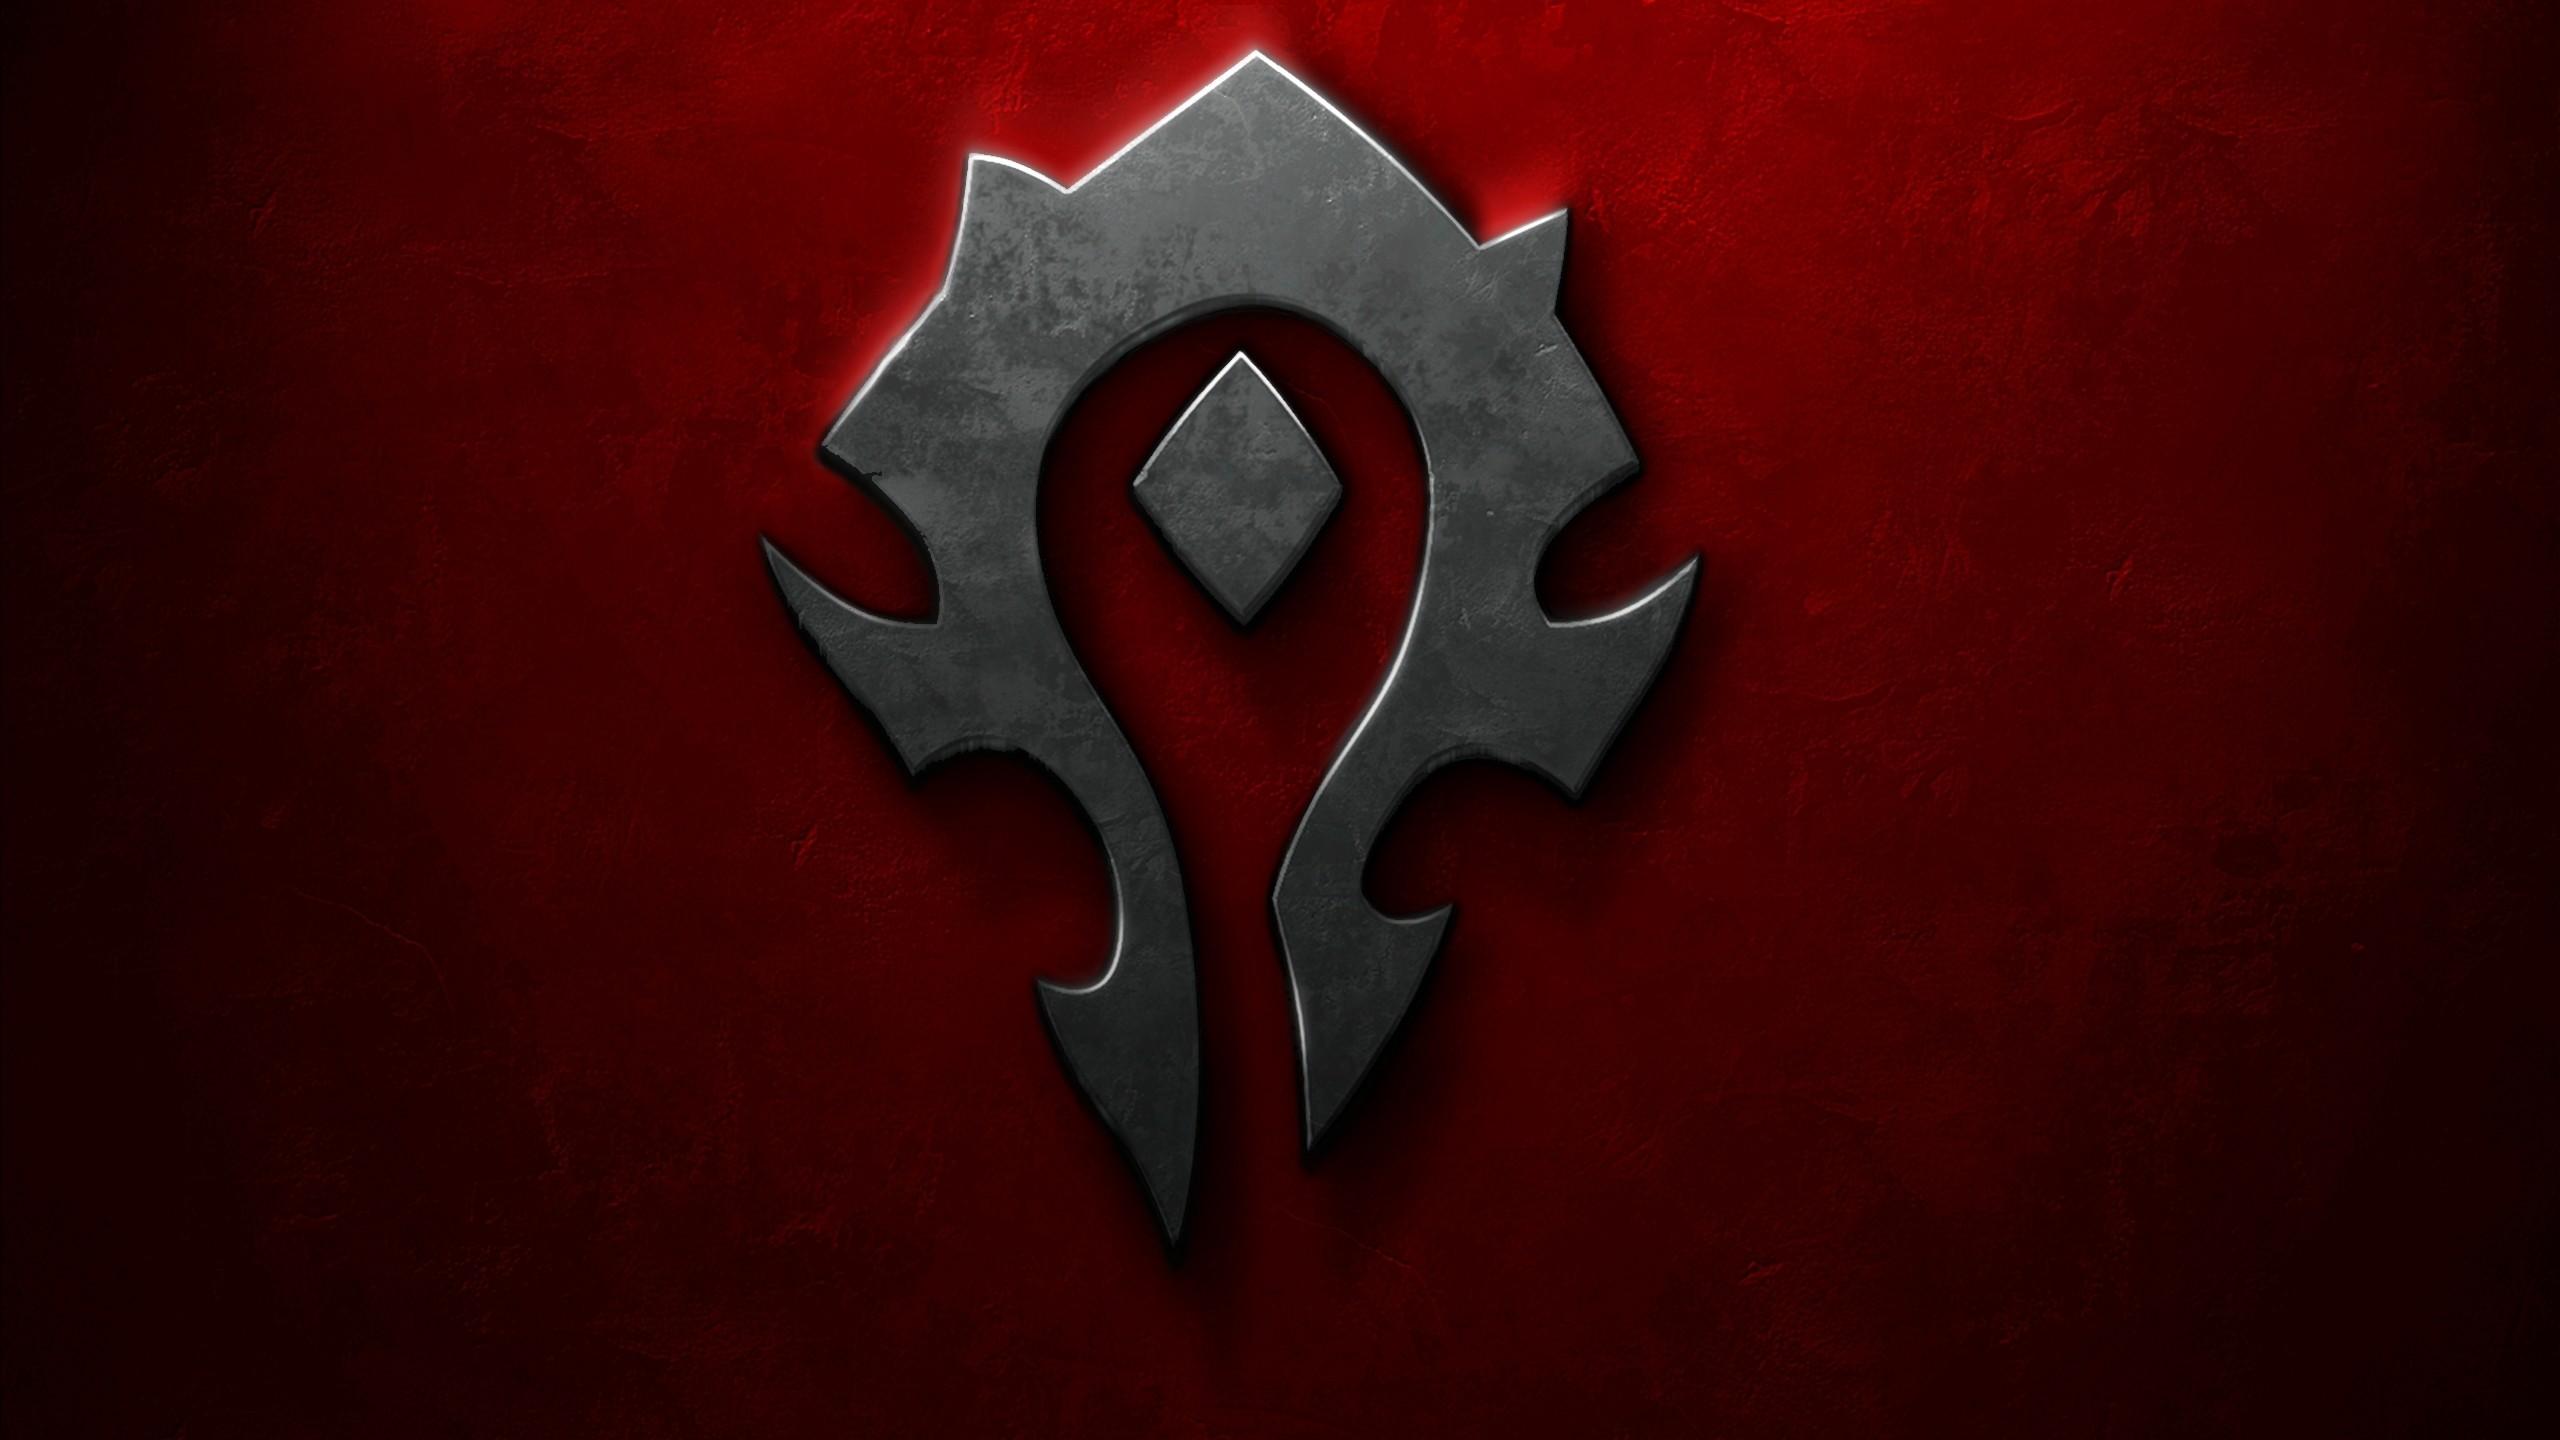 Description: Download Video games world of warcraft pc horde wallpaper/desktop  background in HD & Widescreen resolution.